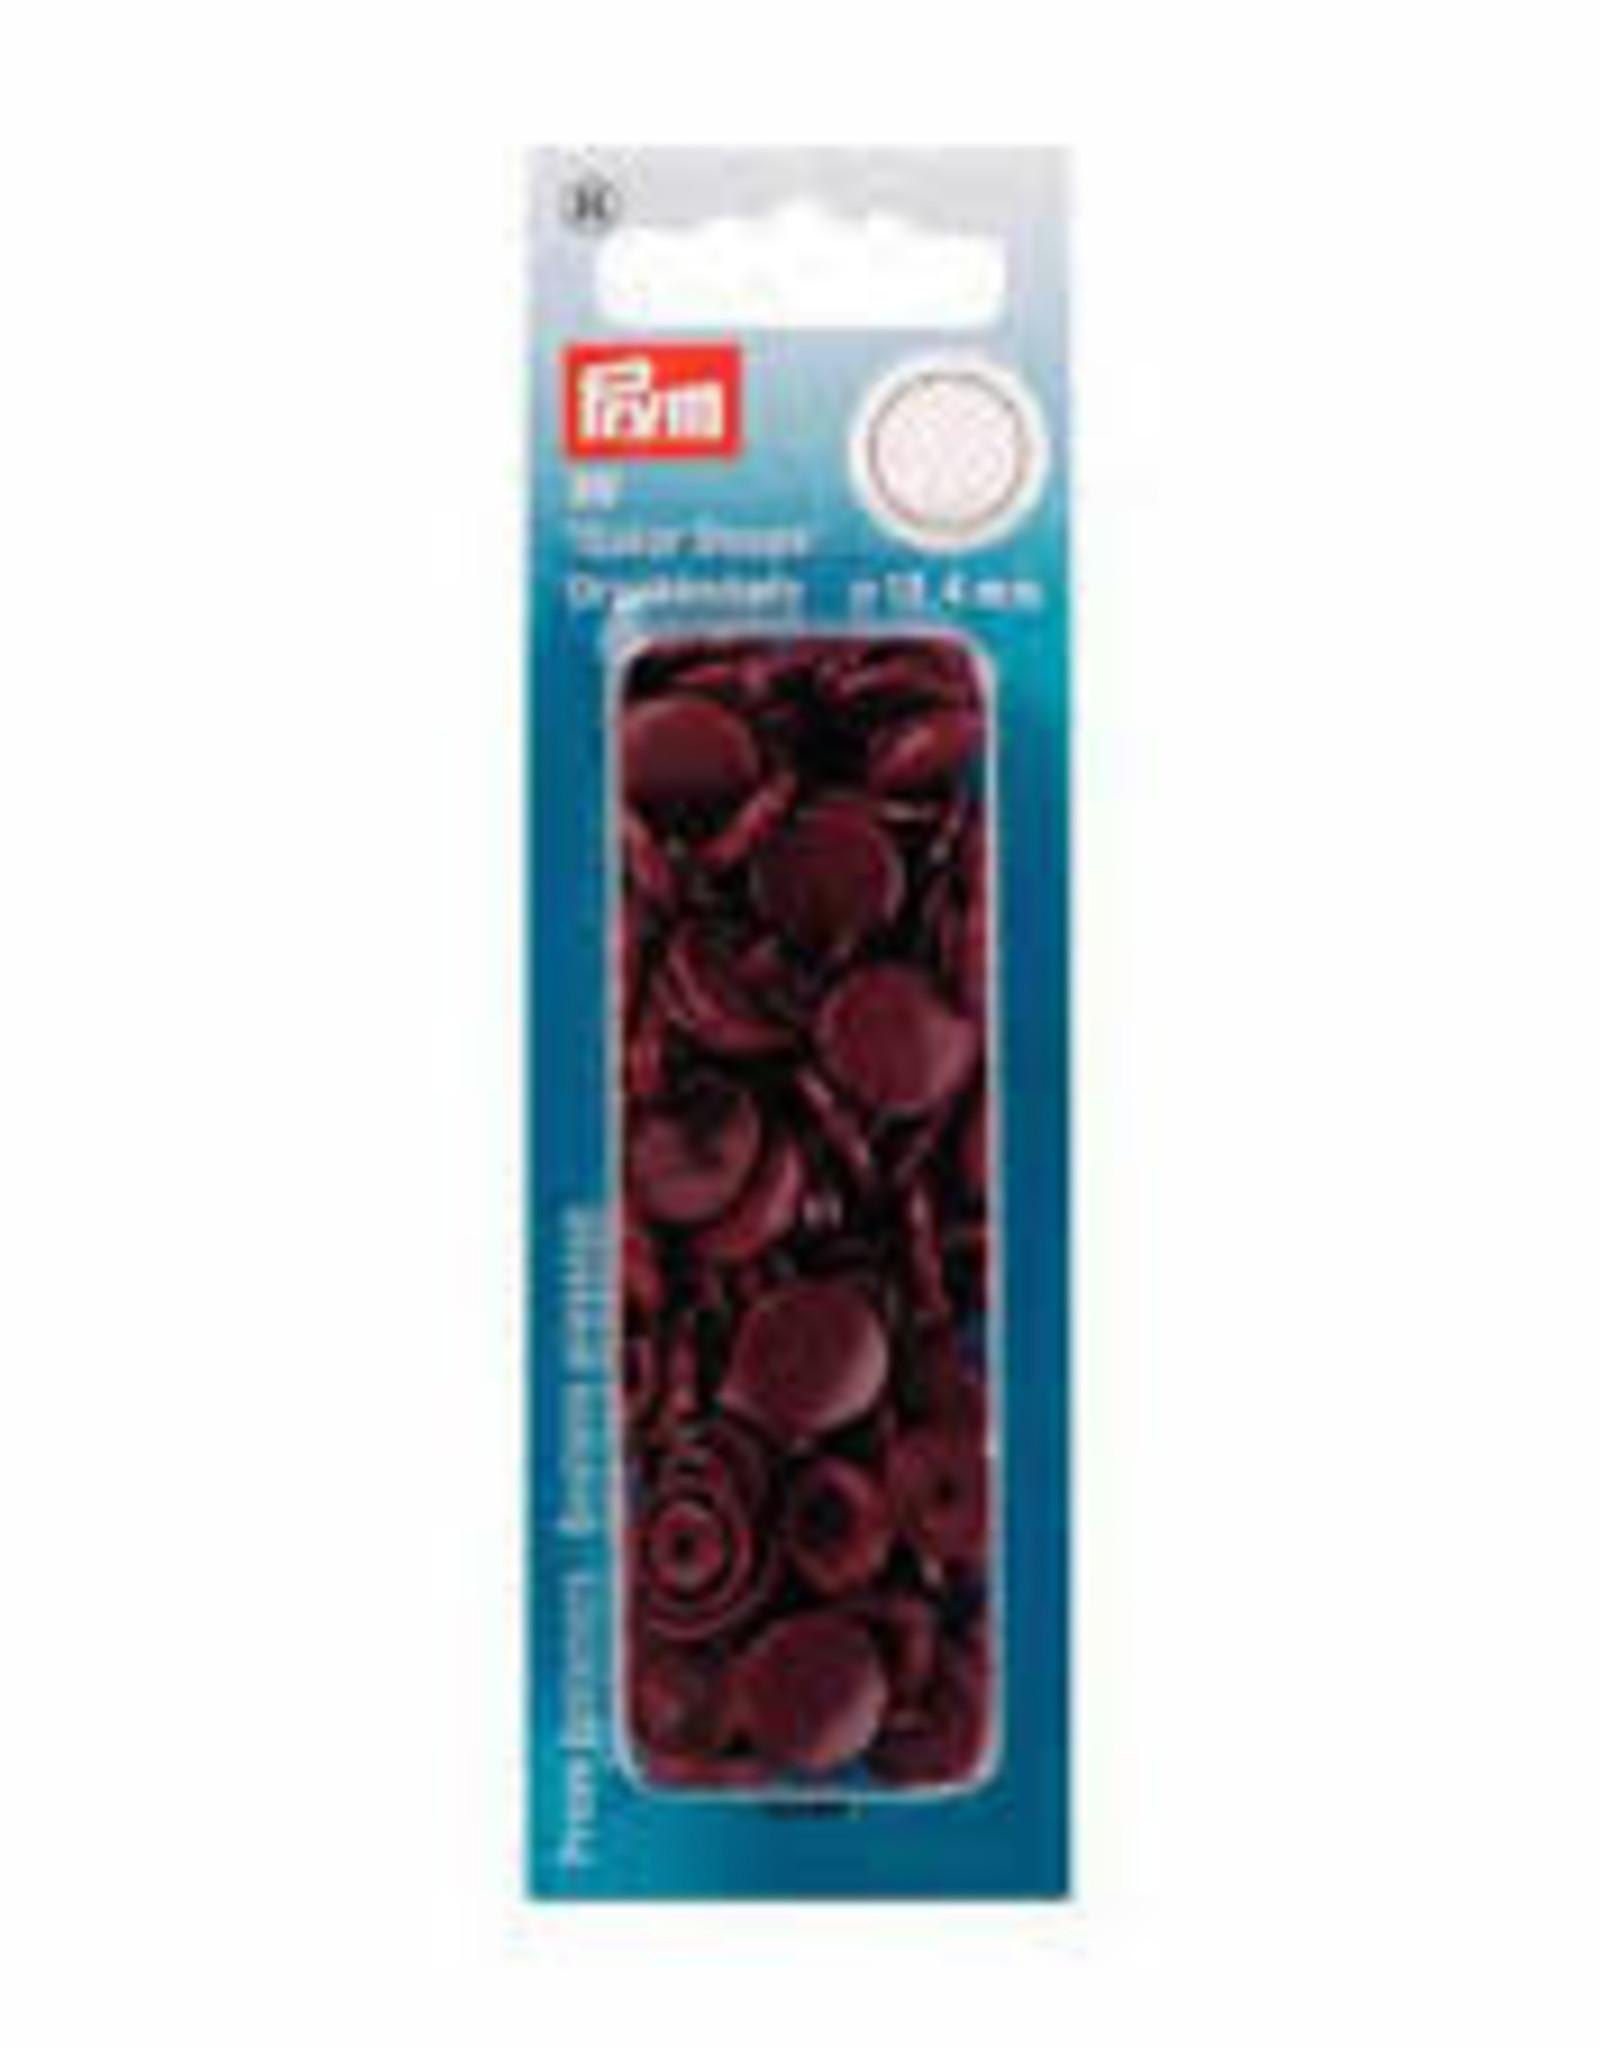 Prym Prym - drukknopen bruin - 393 126